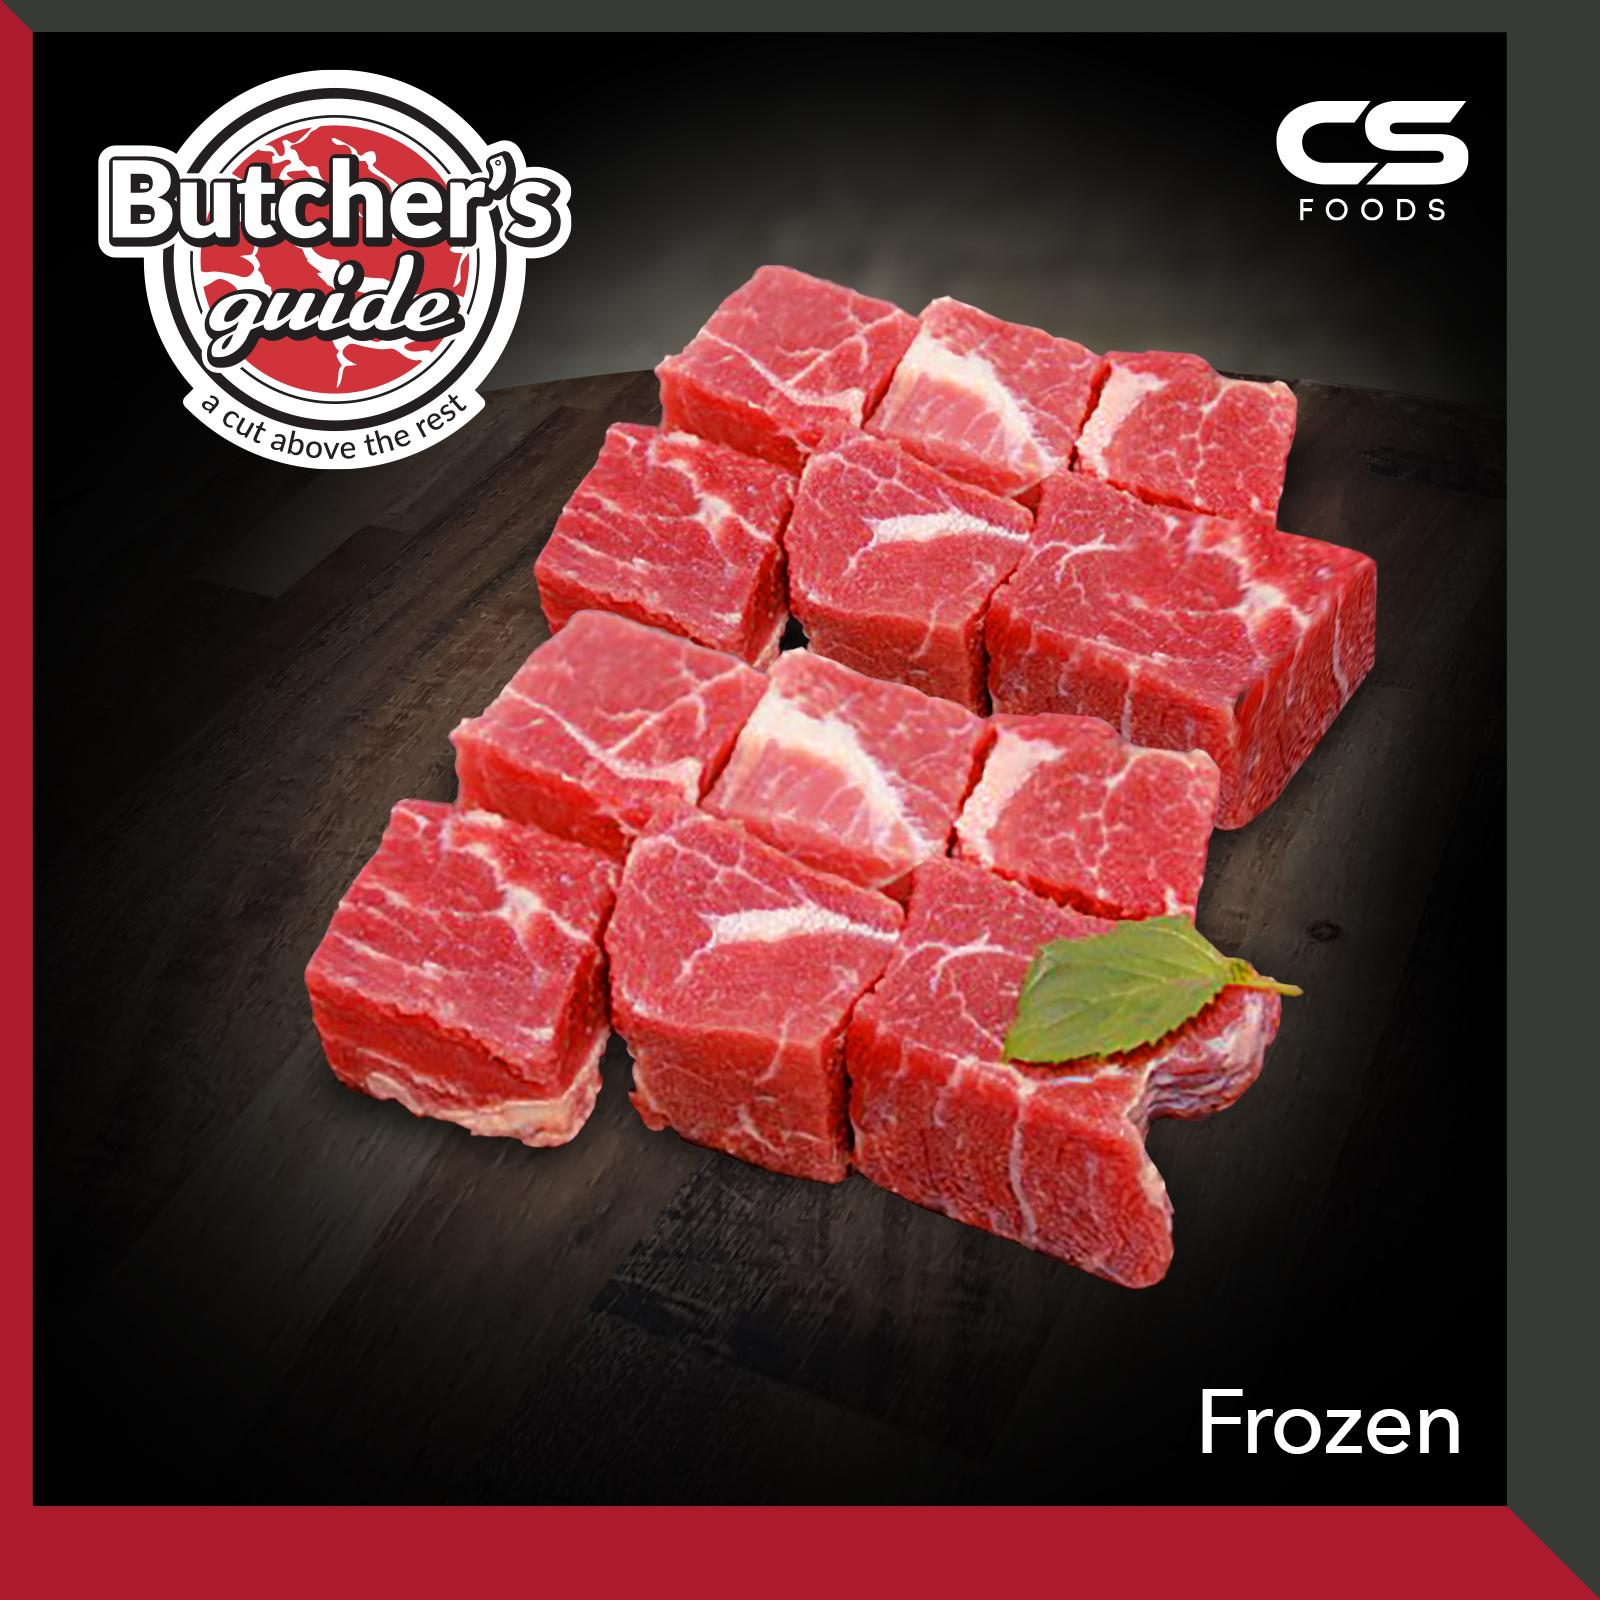 84)CS_Butcher_s-Guide-Beef-Shin-3cm-Cube